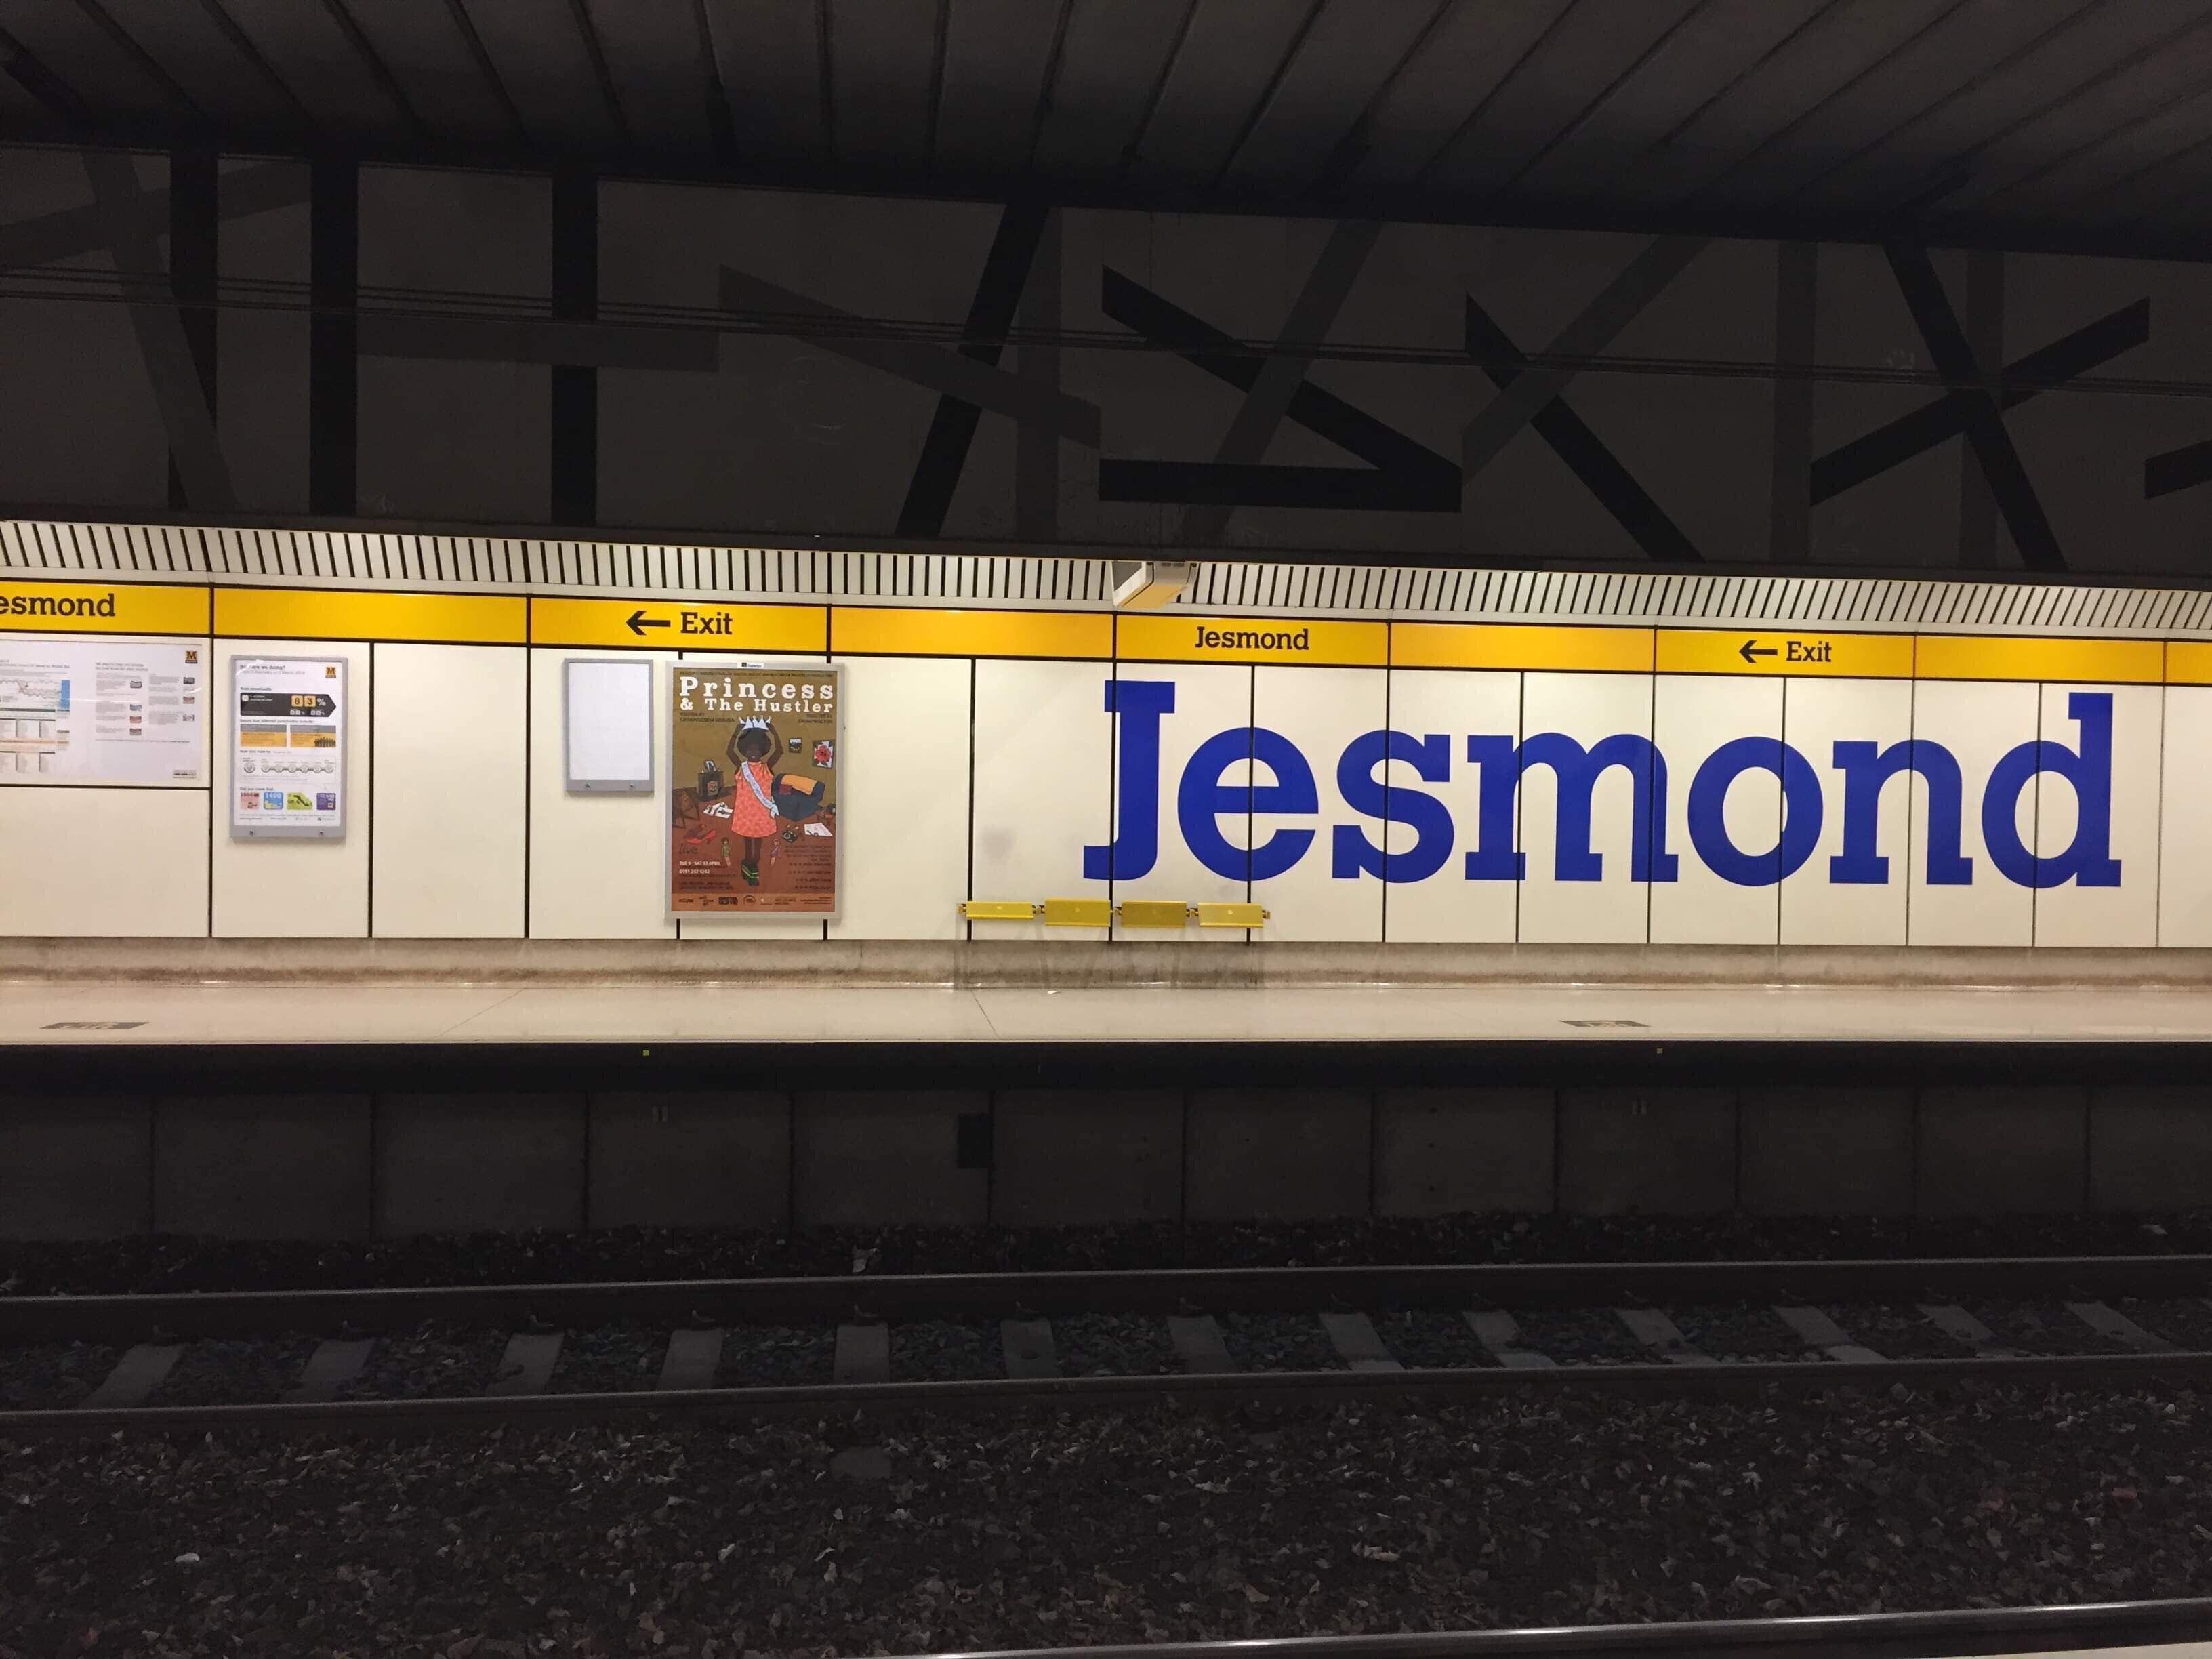 Image may contain: Human, Person, Subway, Transportation, Vehicle, Train, Train Station, Terminal